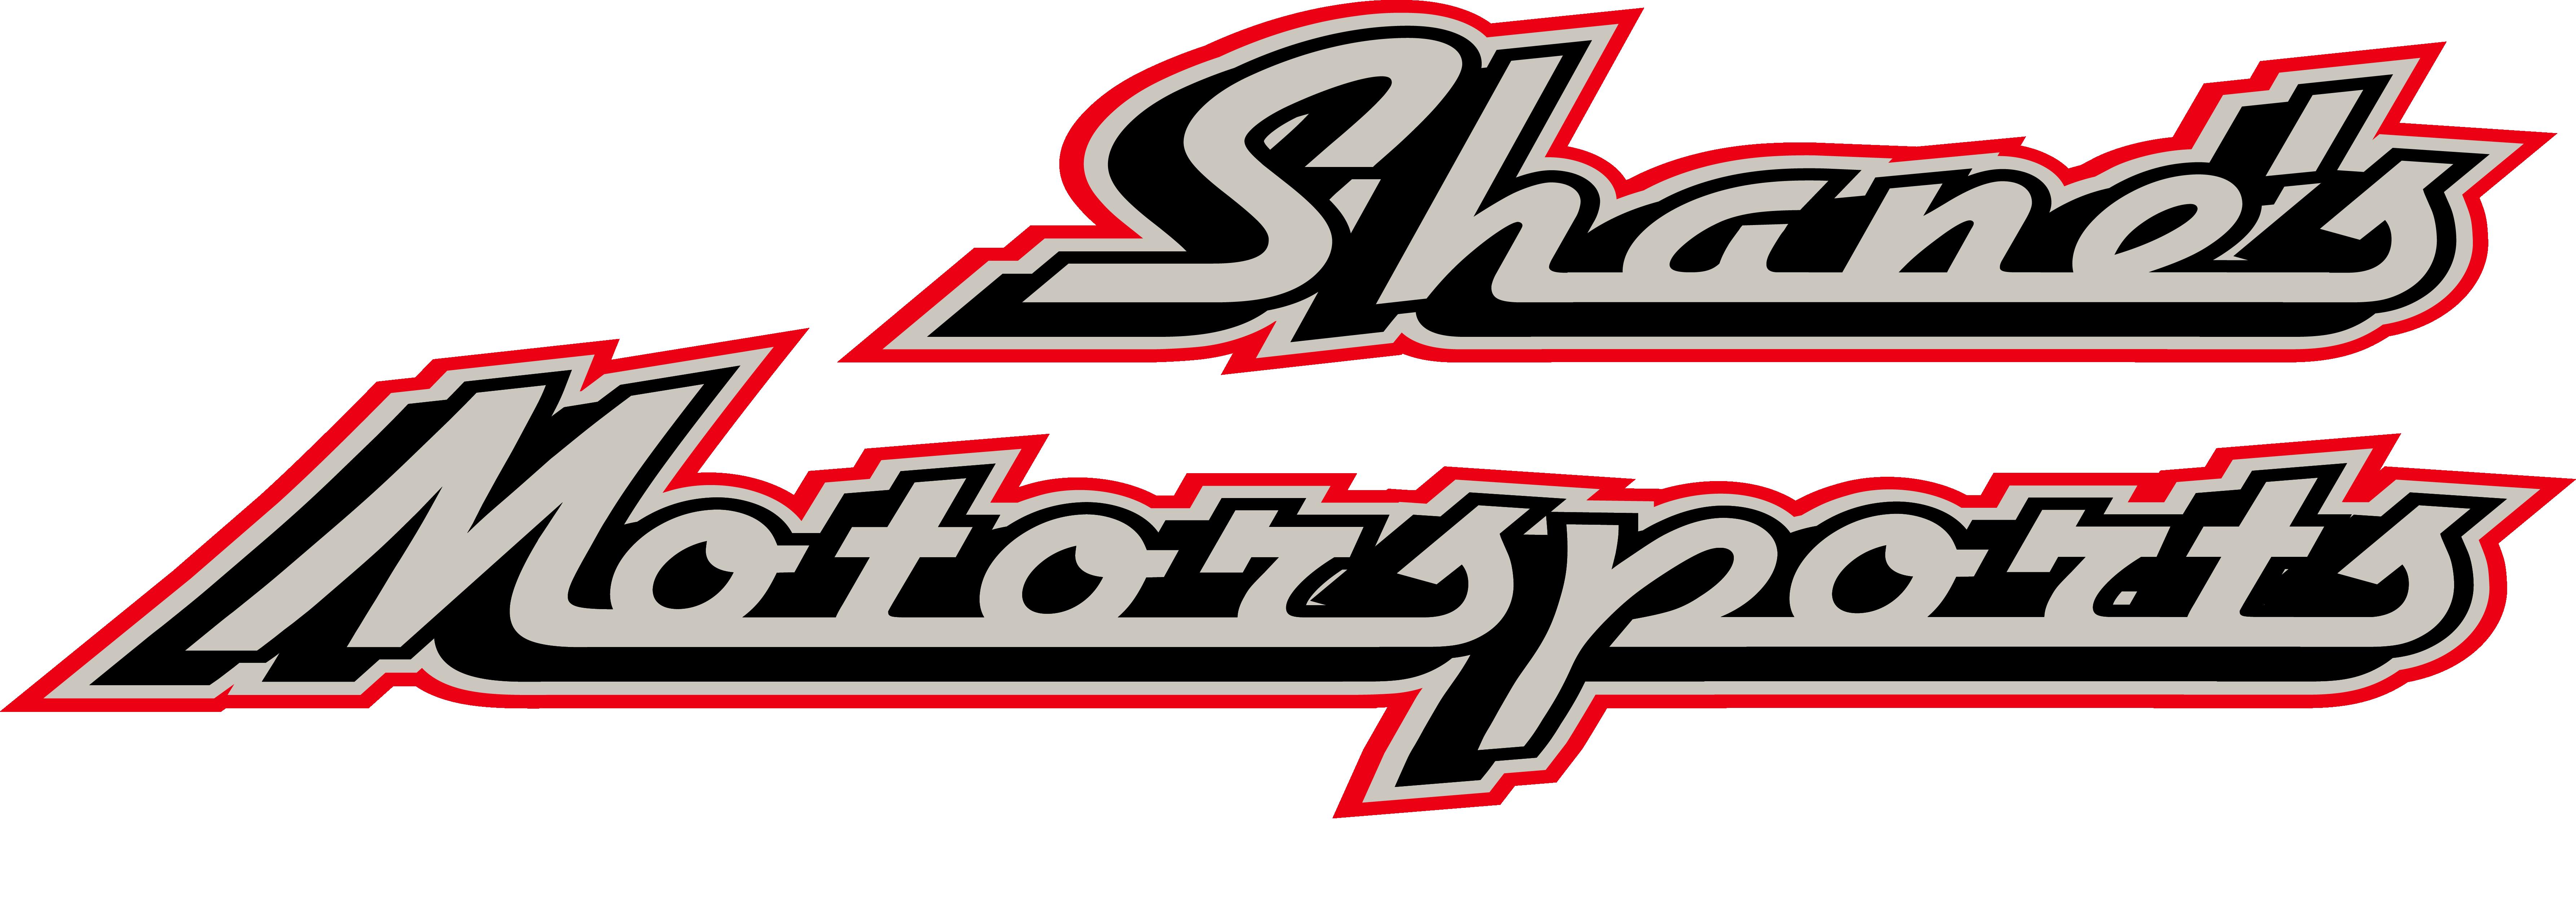 shanes motorsports logo tall